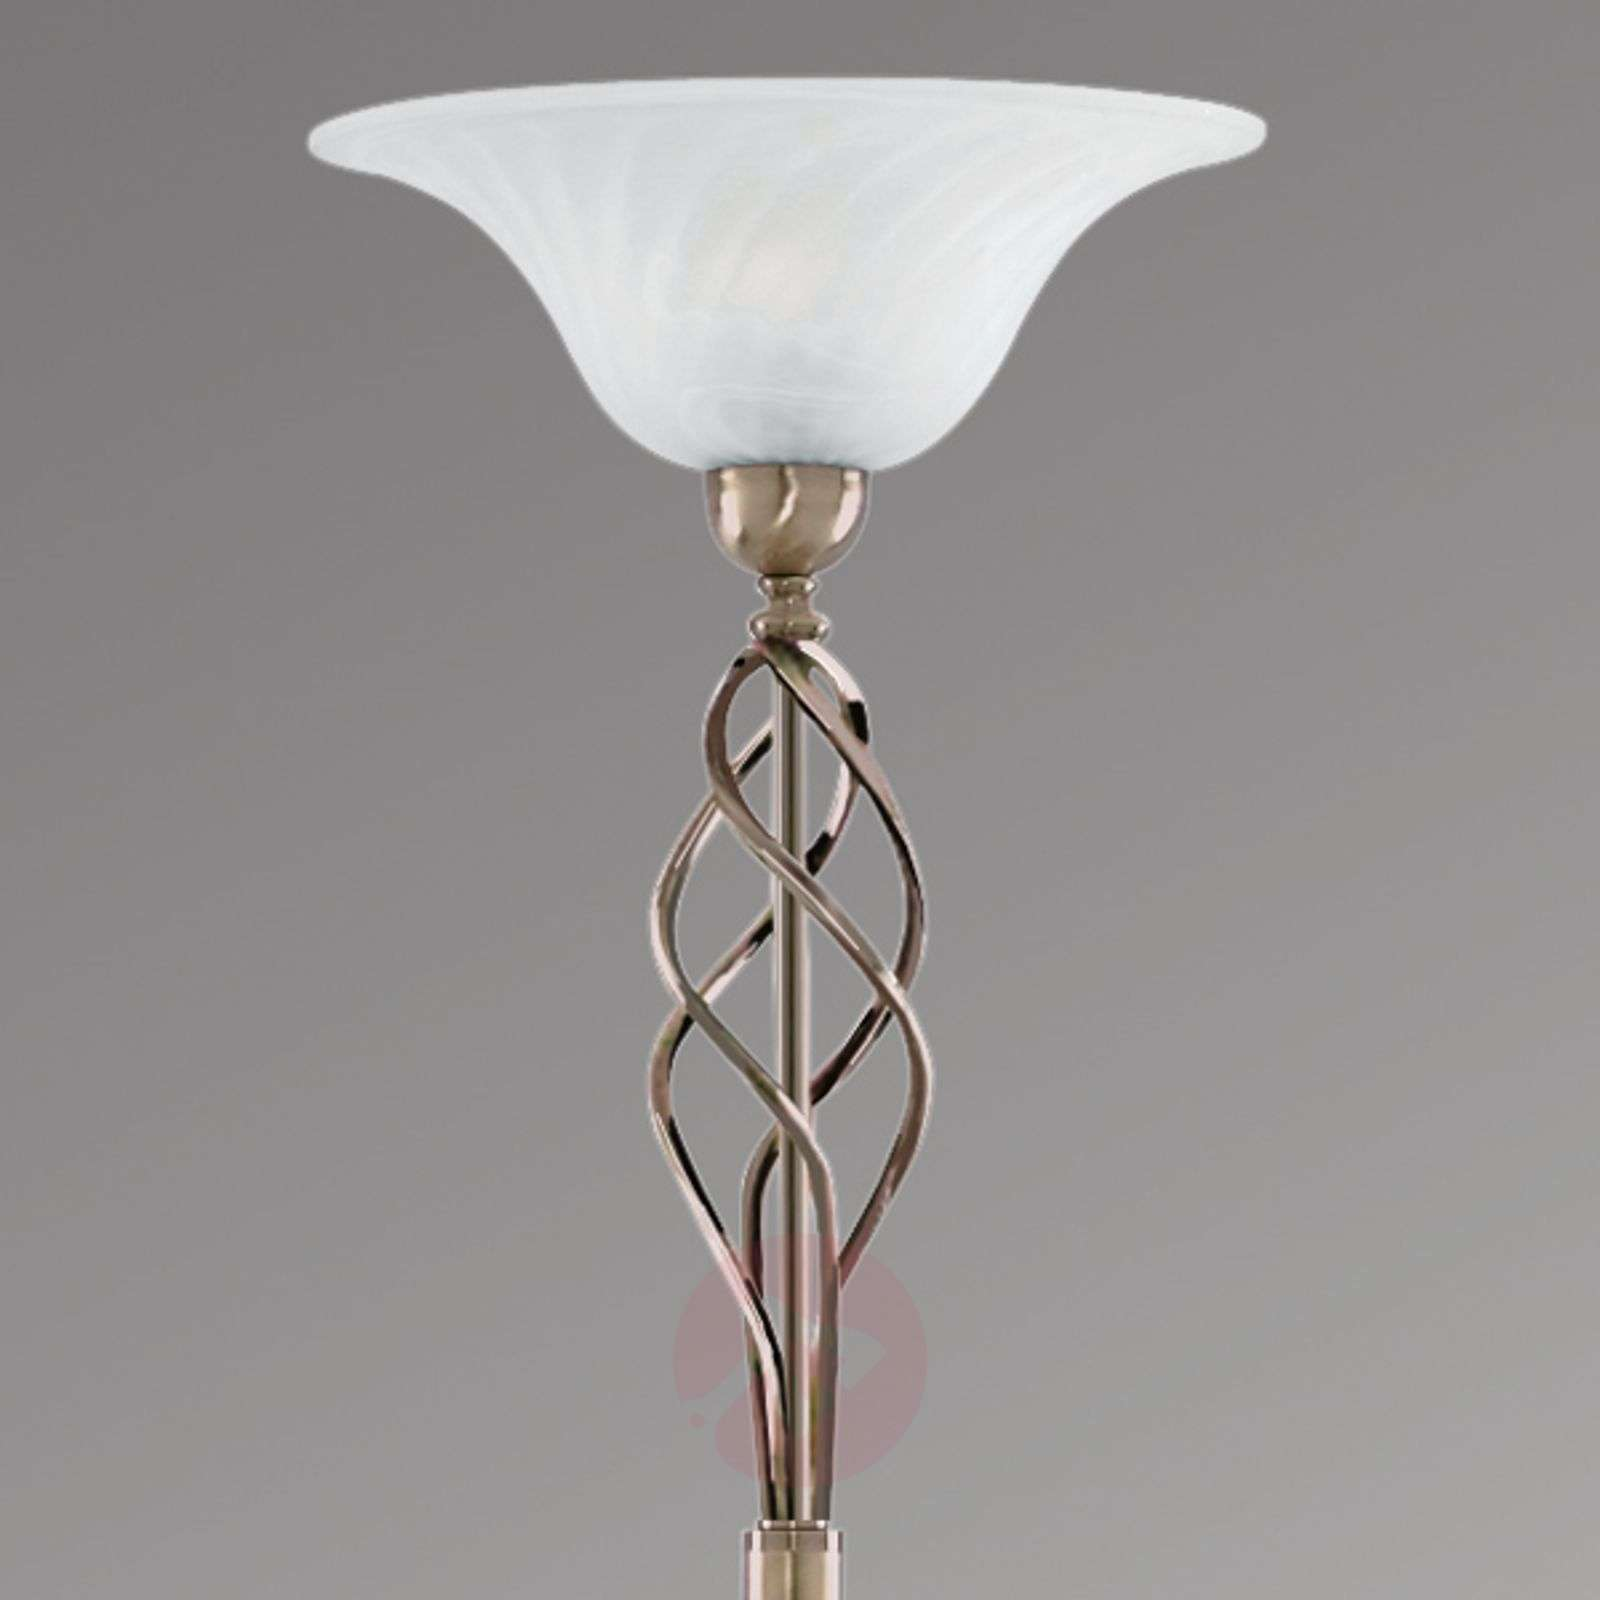 Fionna ceiling uplighter, antique brass-8570252-01